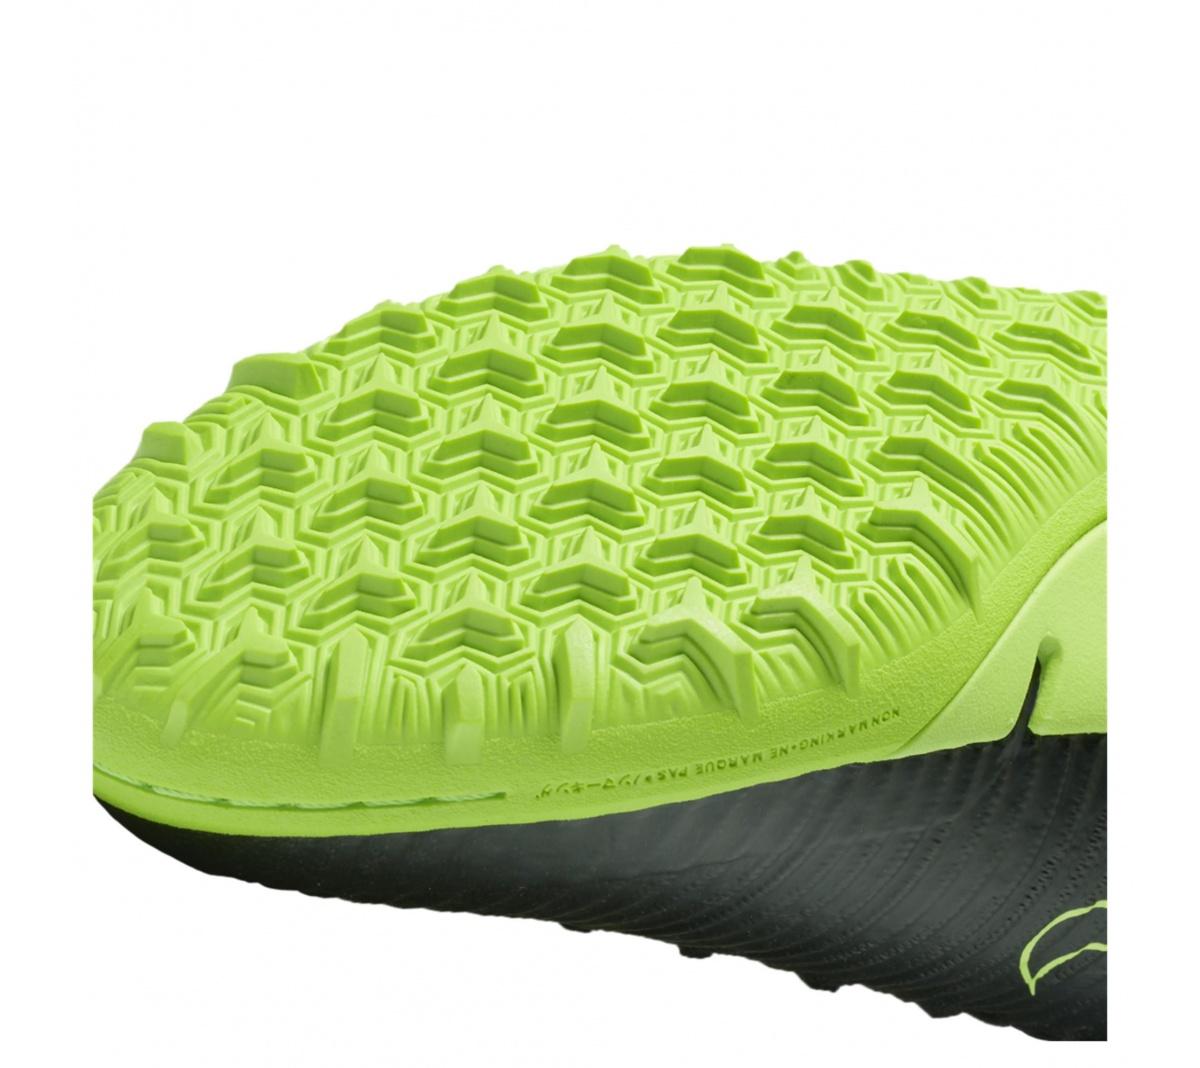 Chuteira Nike MercurialX Proximo II Society